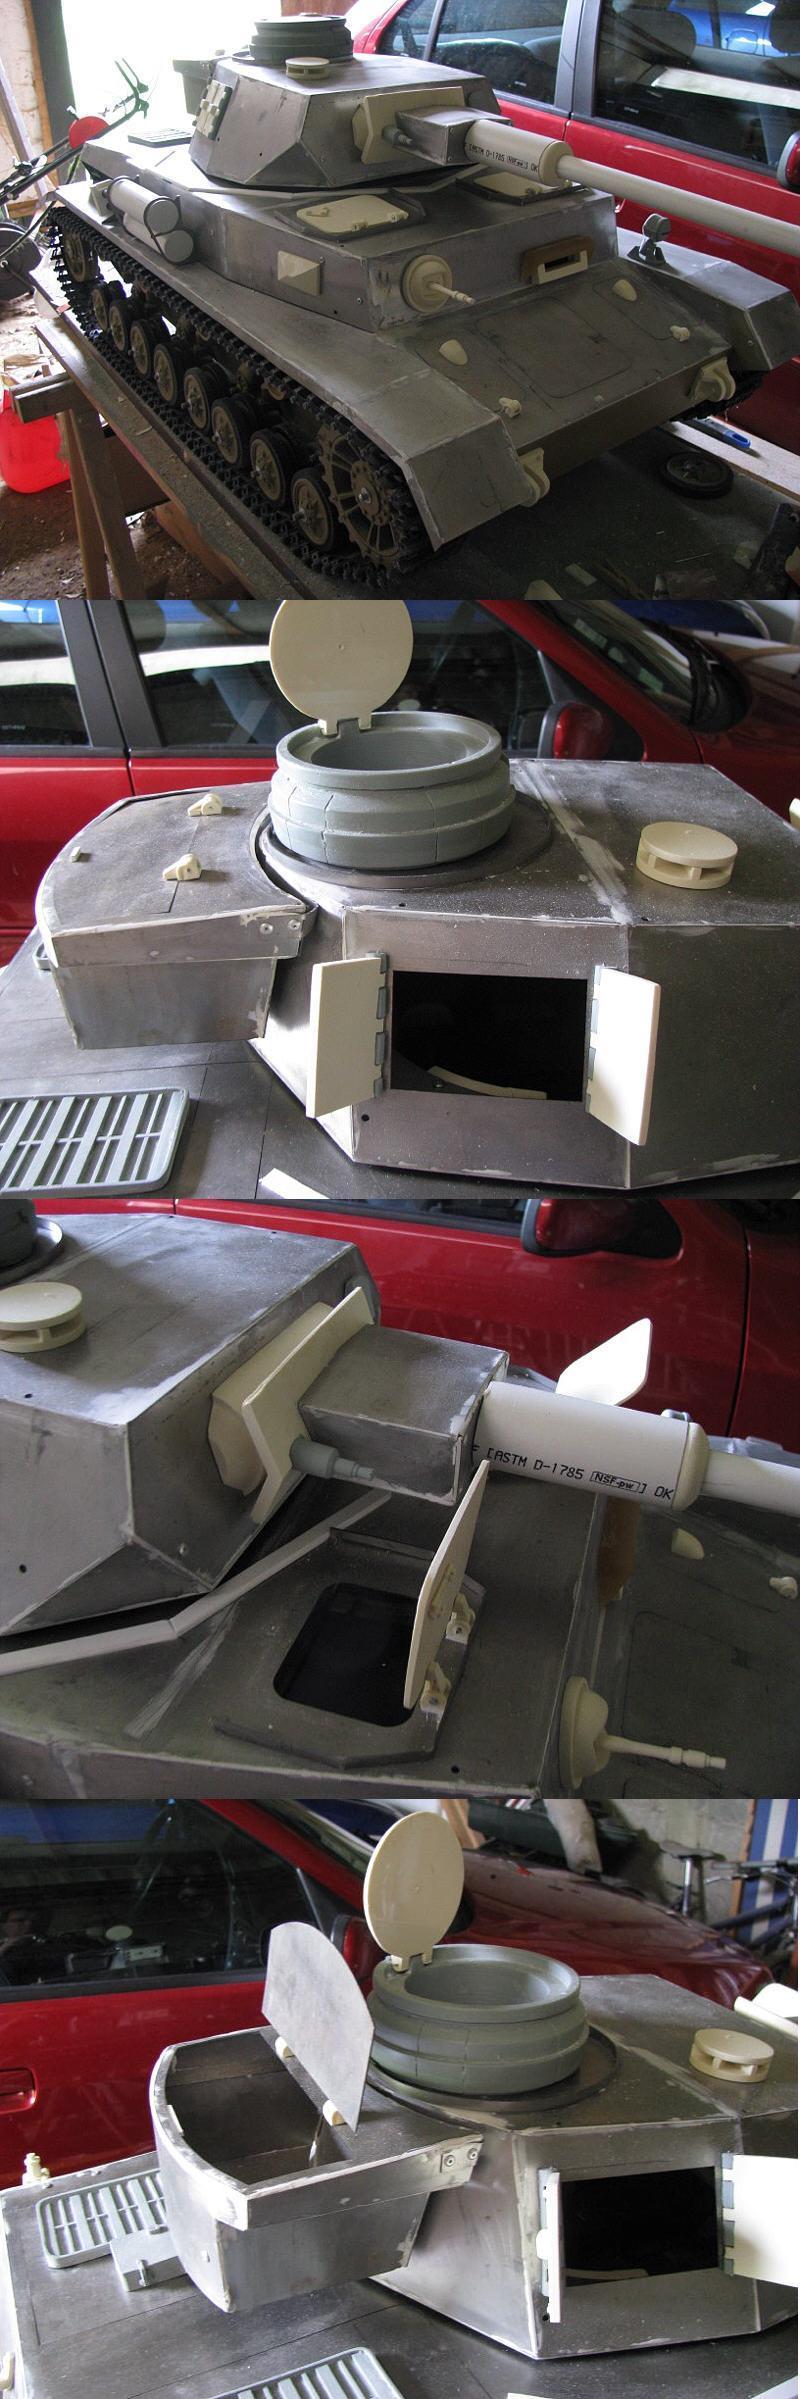 FOA Panzer IV auf H Photo186